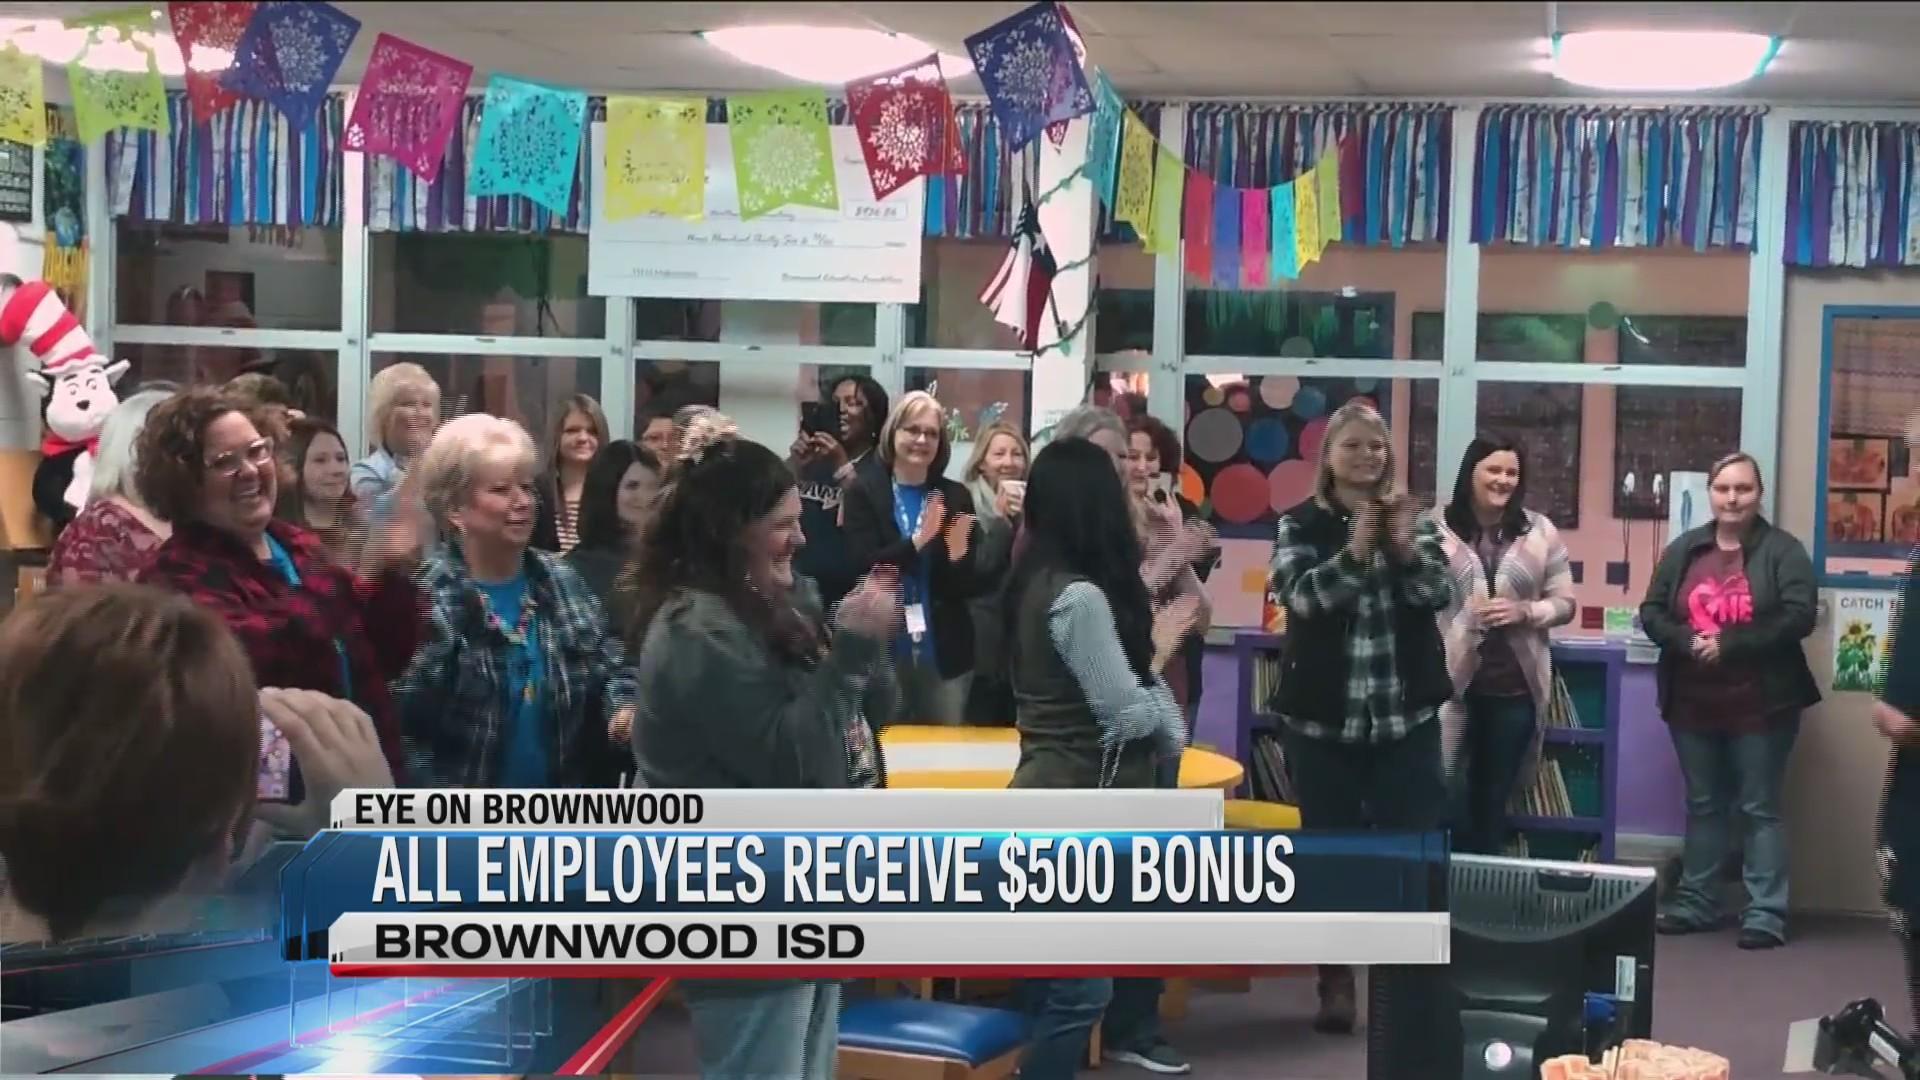 Brownwood_ISD_employees_receive__500_bon_0_20181117001116